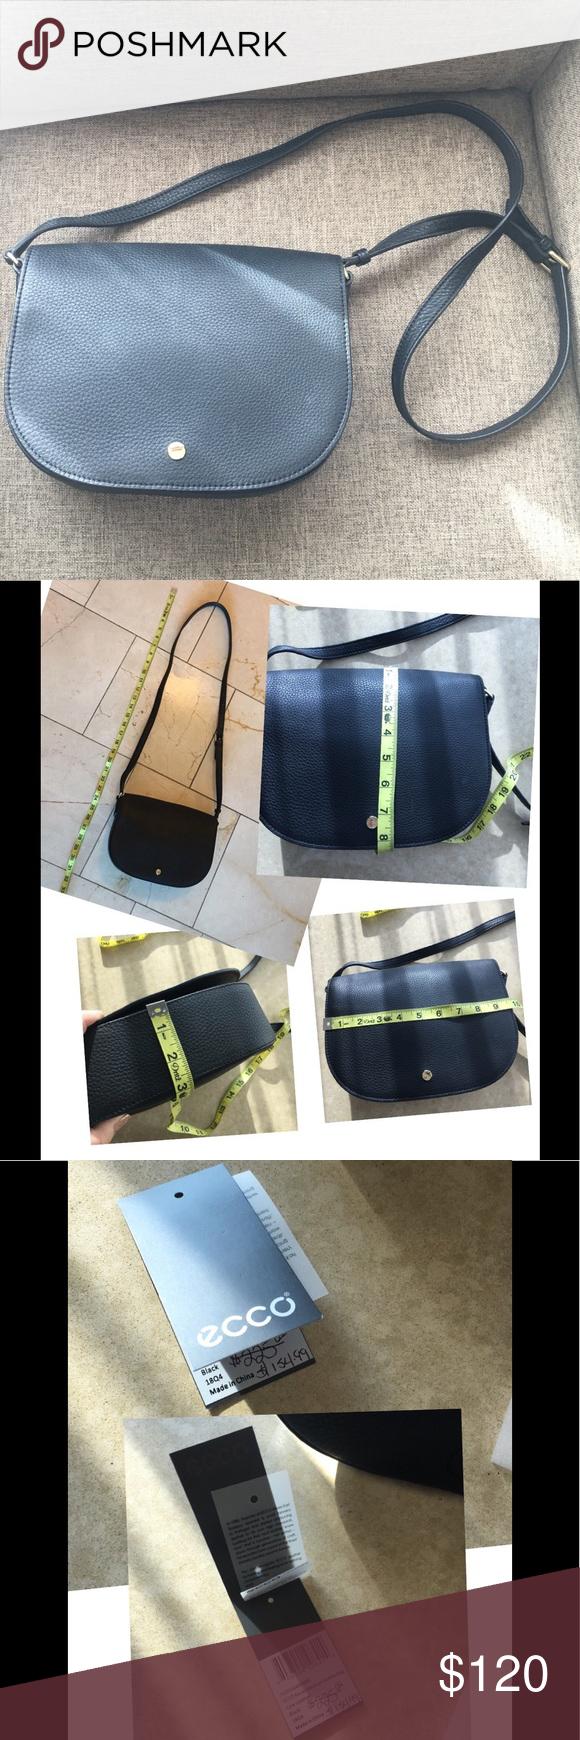 58a858ba57 Ecco Kauai Medium Black Leather Saddle Bag Pristine condition ...